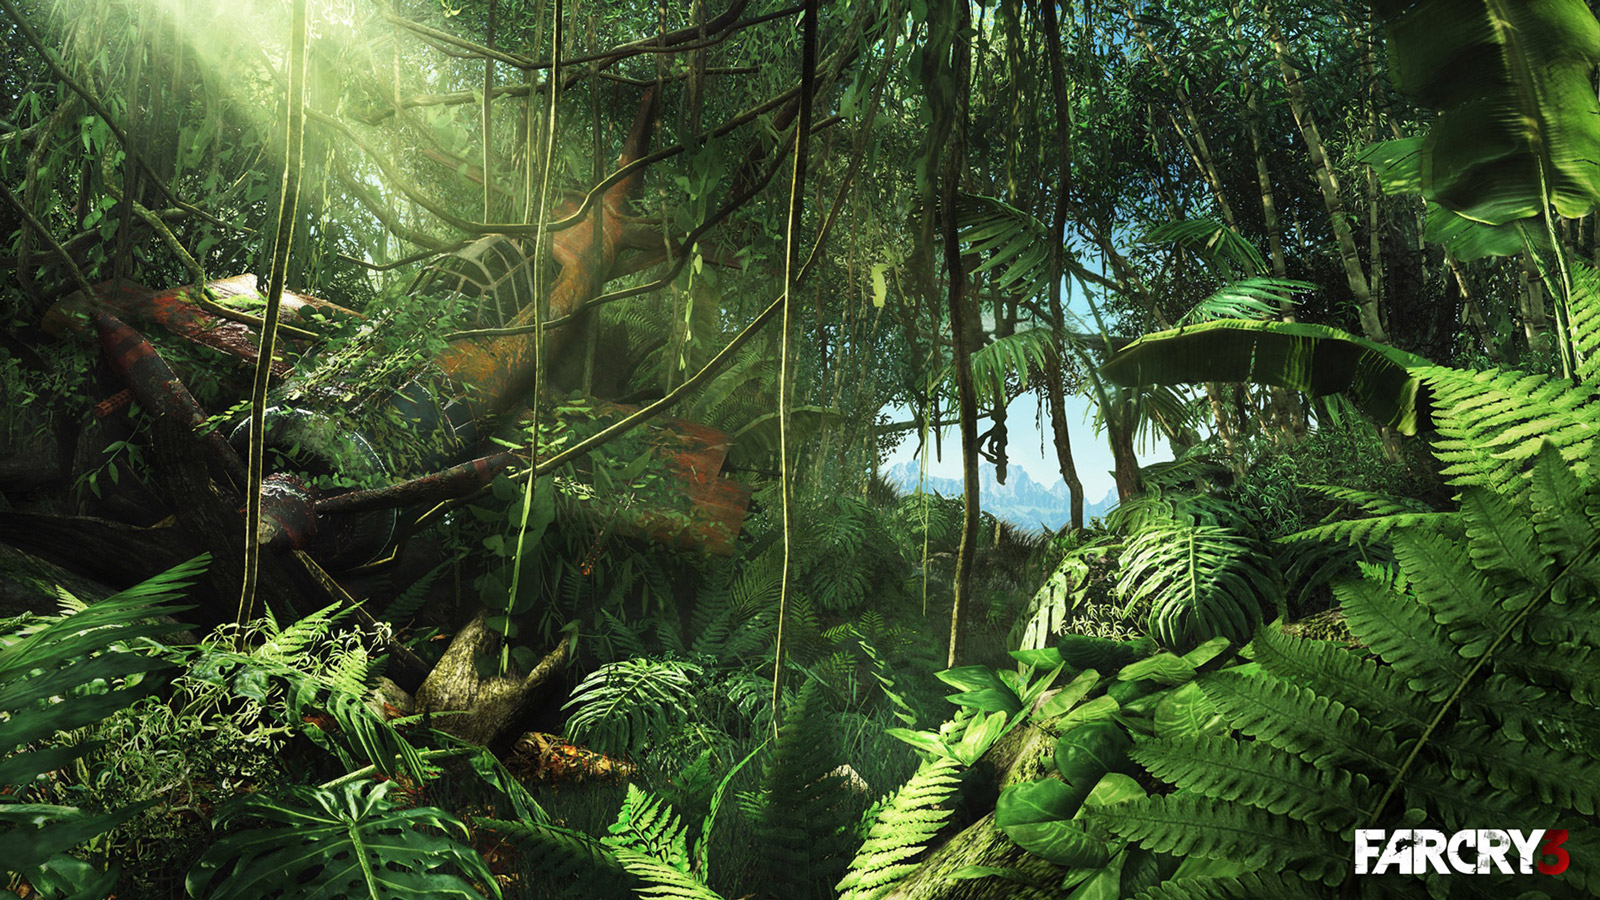 Free Far Cry 3 Wallpaper in 1600x900